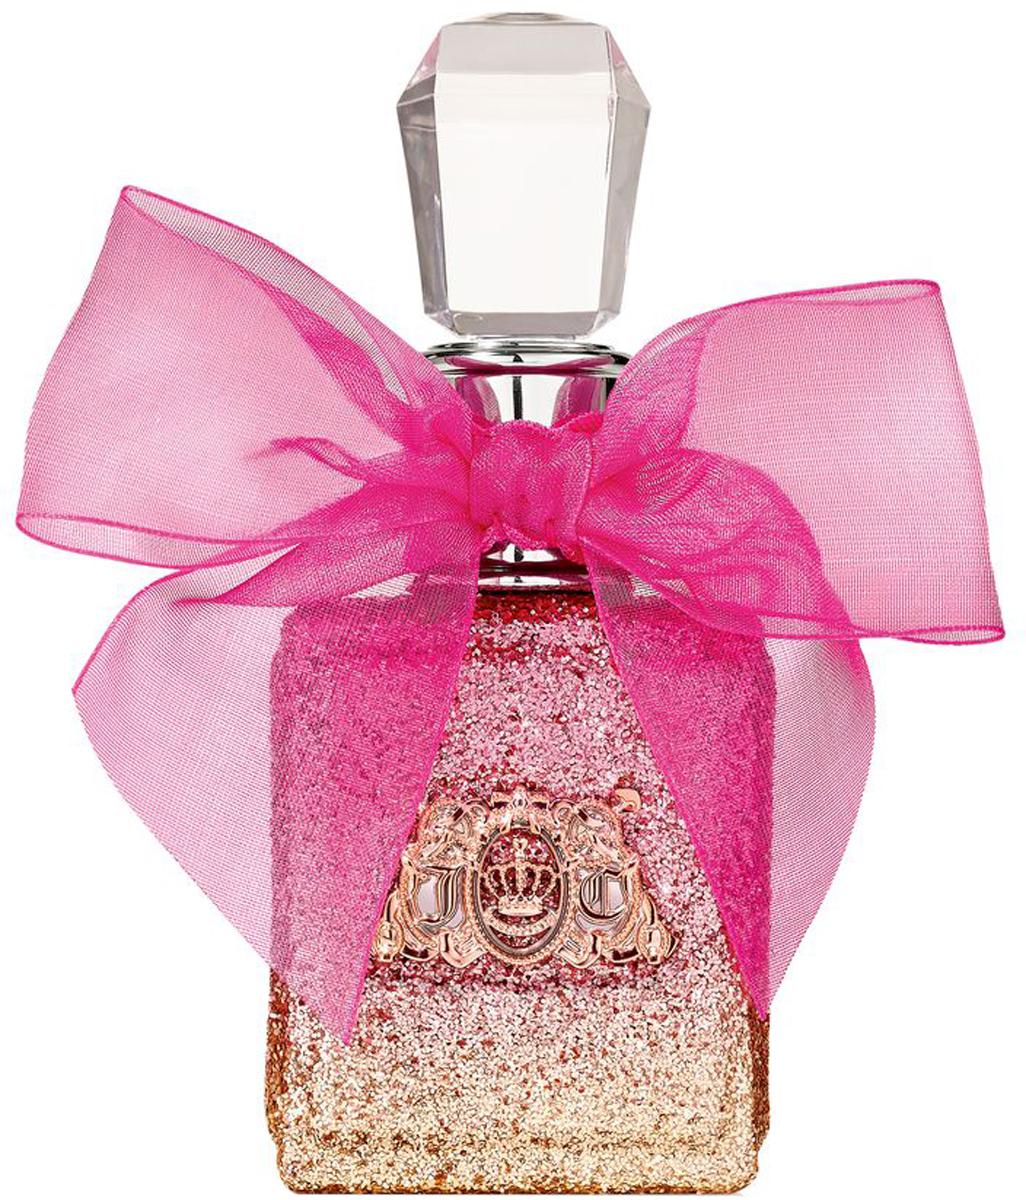 Juicy Couture Viva La Juicy Rose Парфюмерная вода женская, 30 мл juicy couture viva la juicy rose парфюмерная вода женская 30 мл